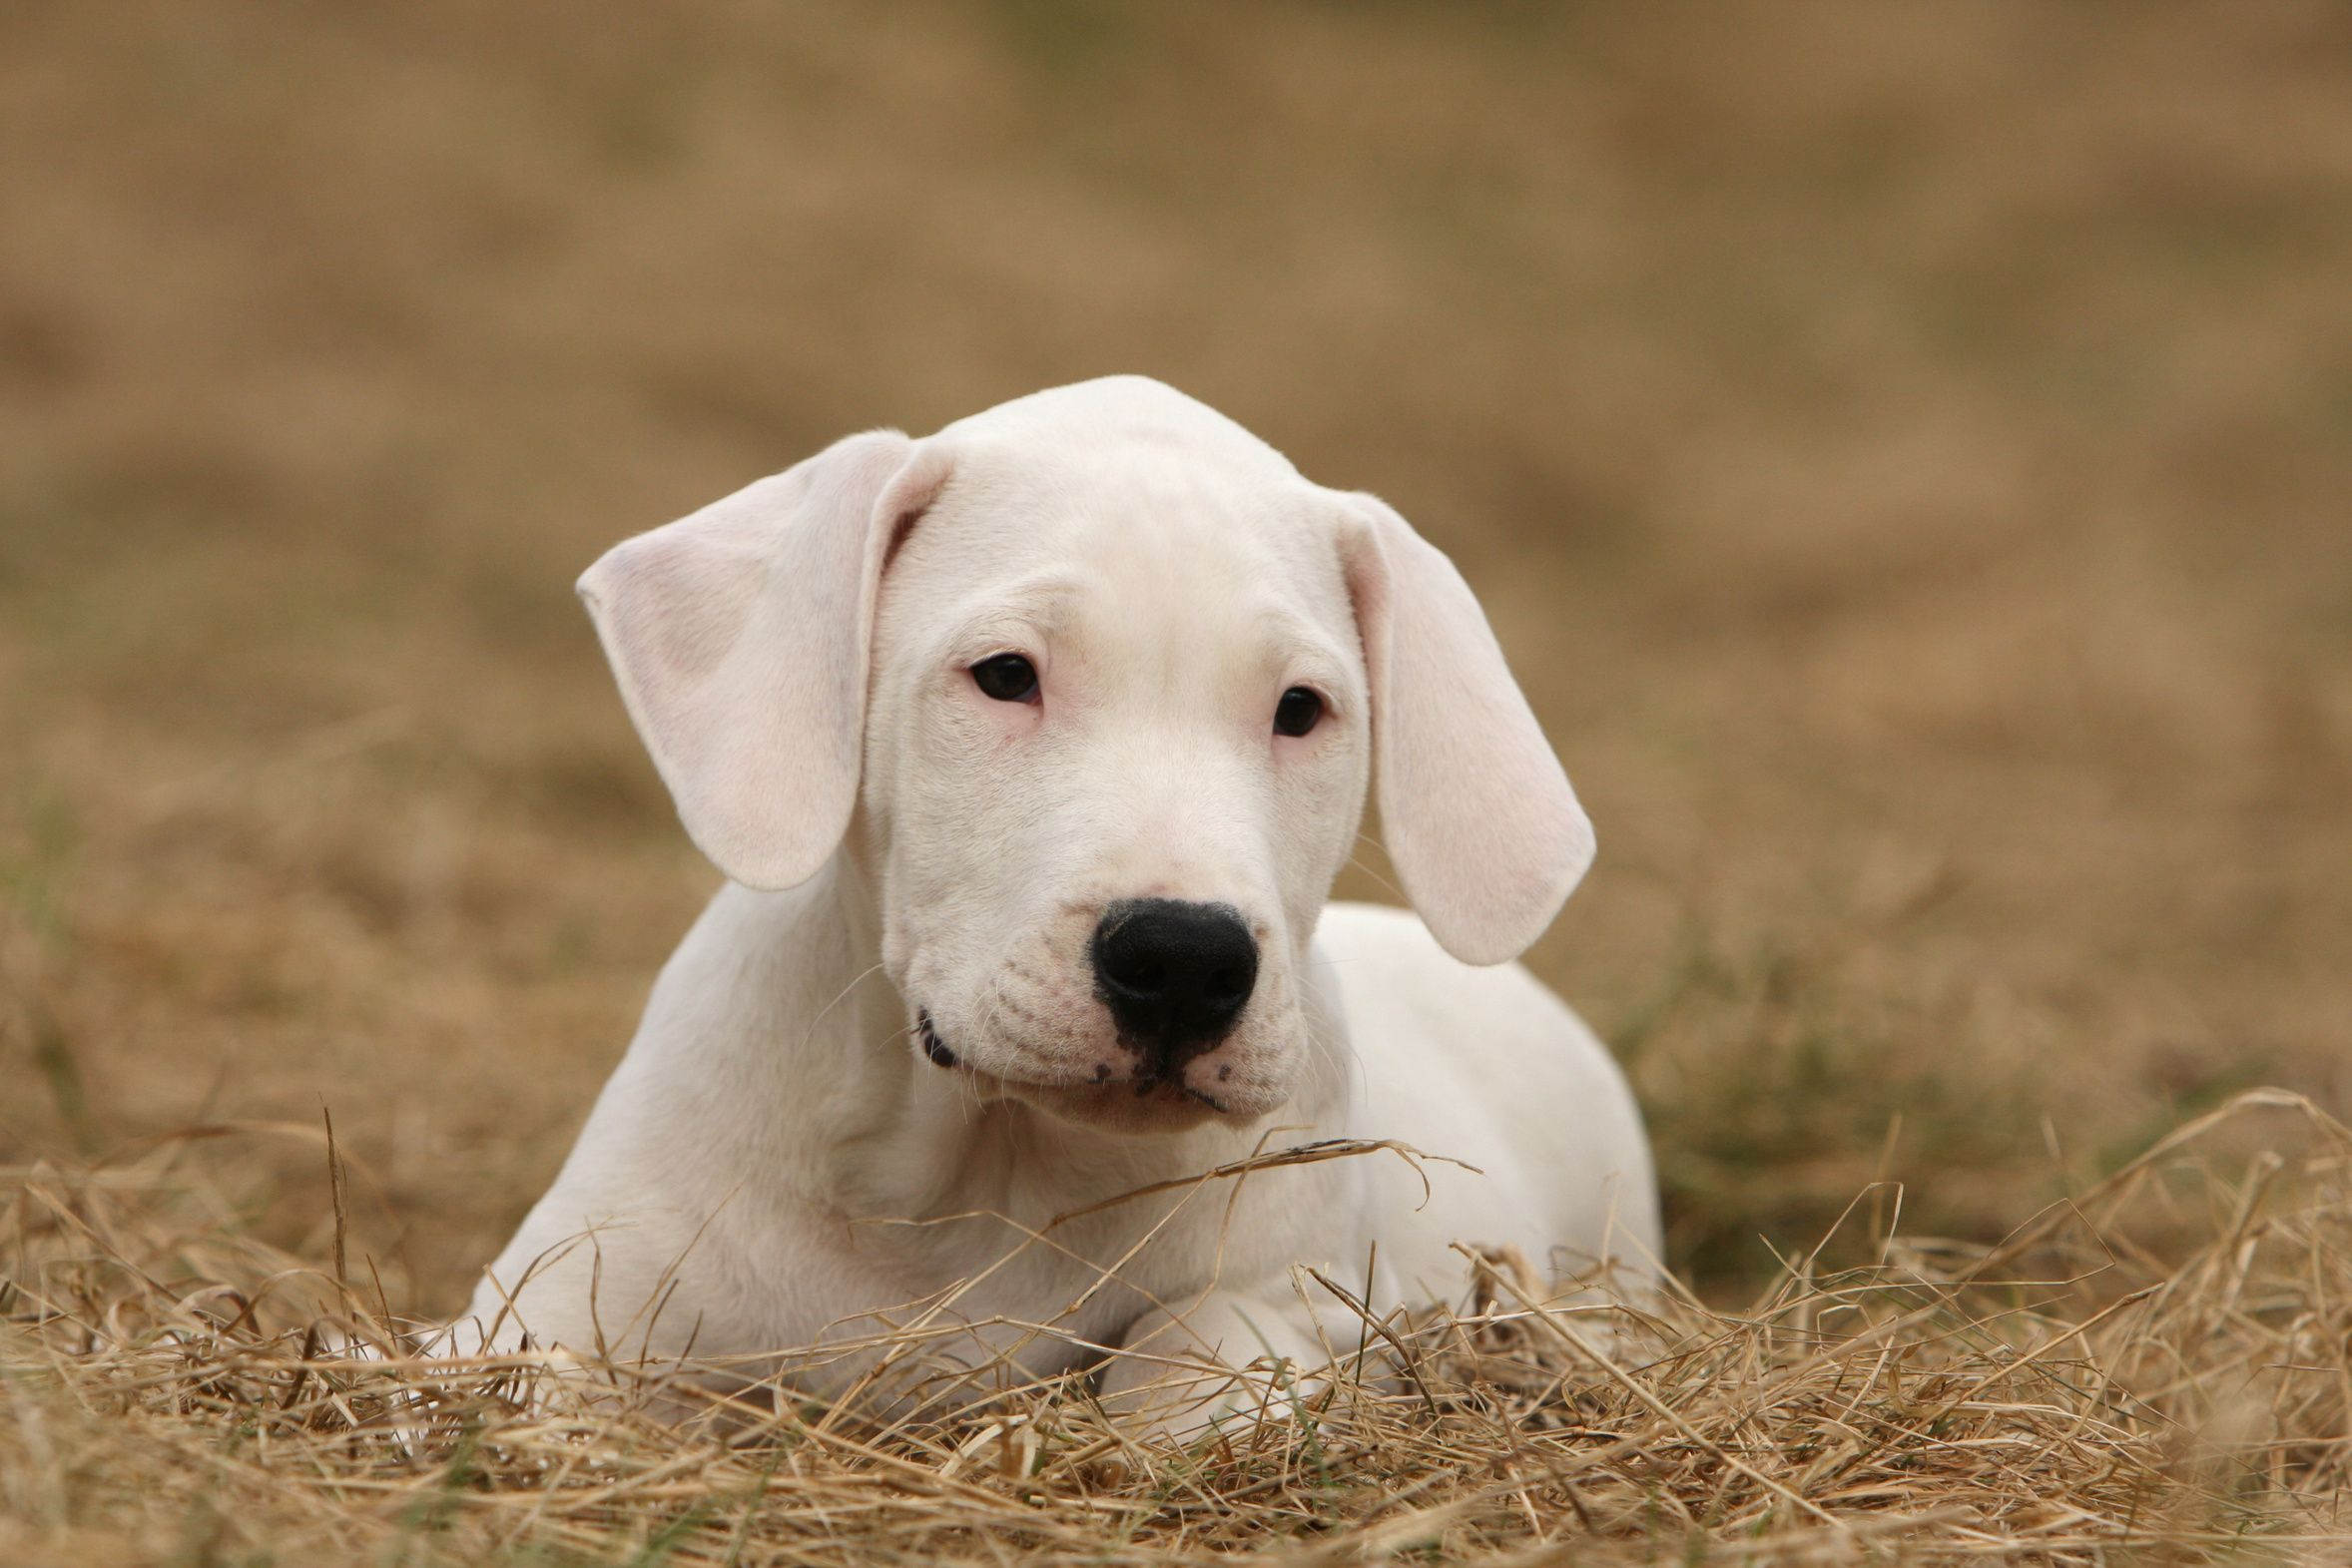 Dogo Argentino Puppy On Dried Grass Dogs Dog Breeds Dog Training